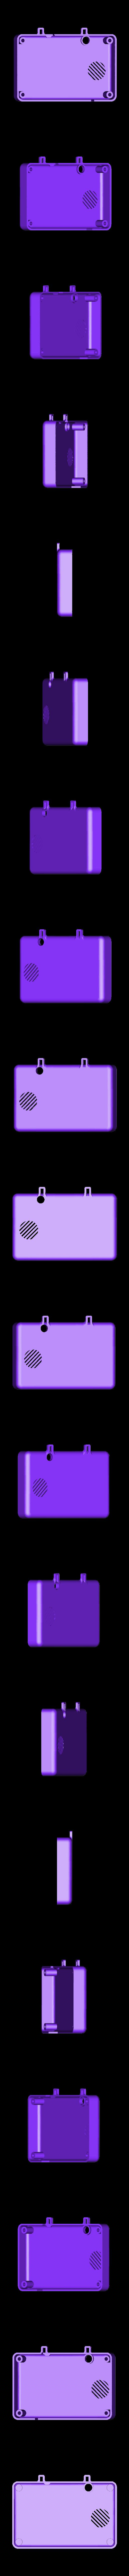 pybadge-back.stl Download free STL file PyBadge Case • 3D print model, Adafruit